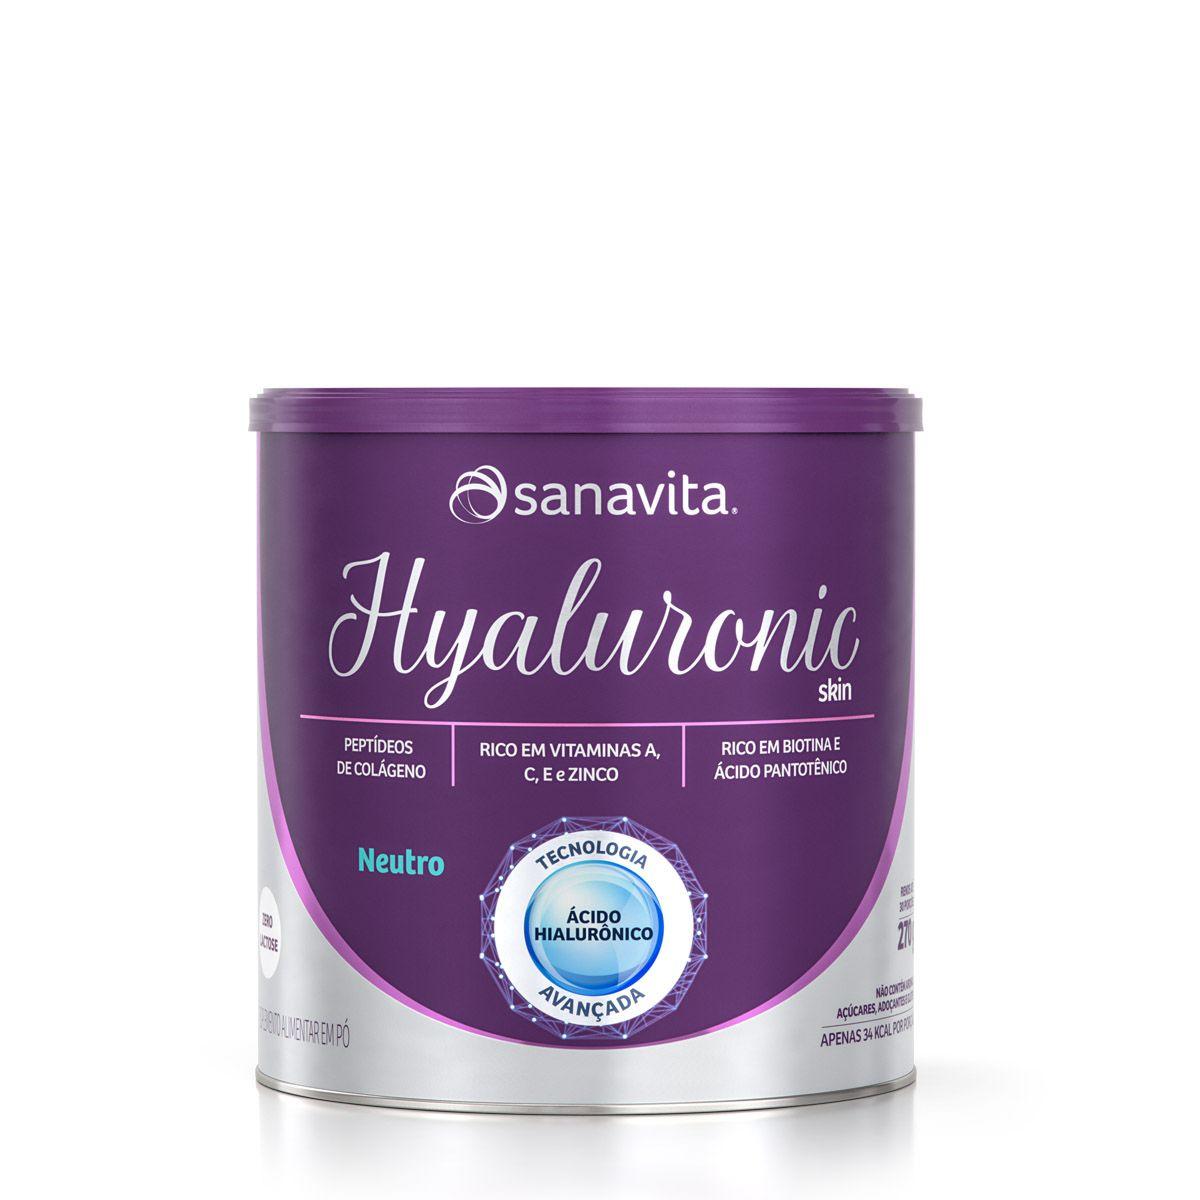 Hyaluronic Skin- Neutro (270g.)